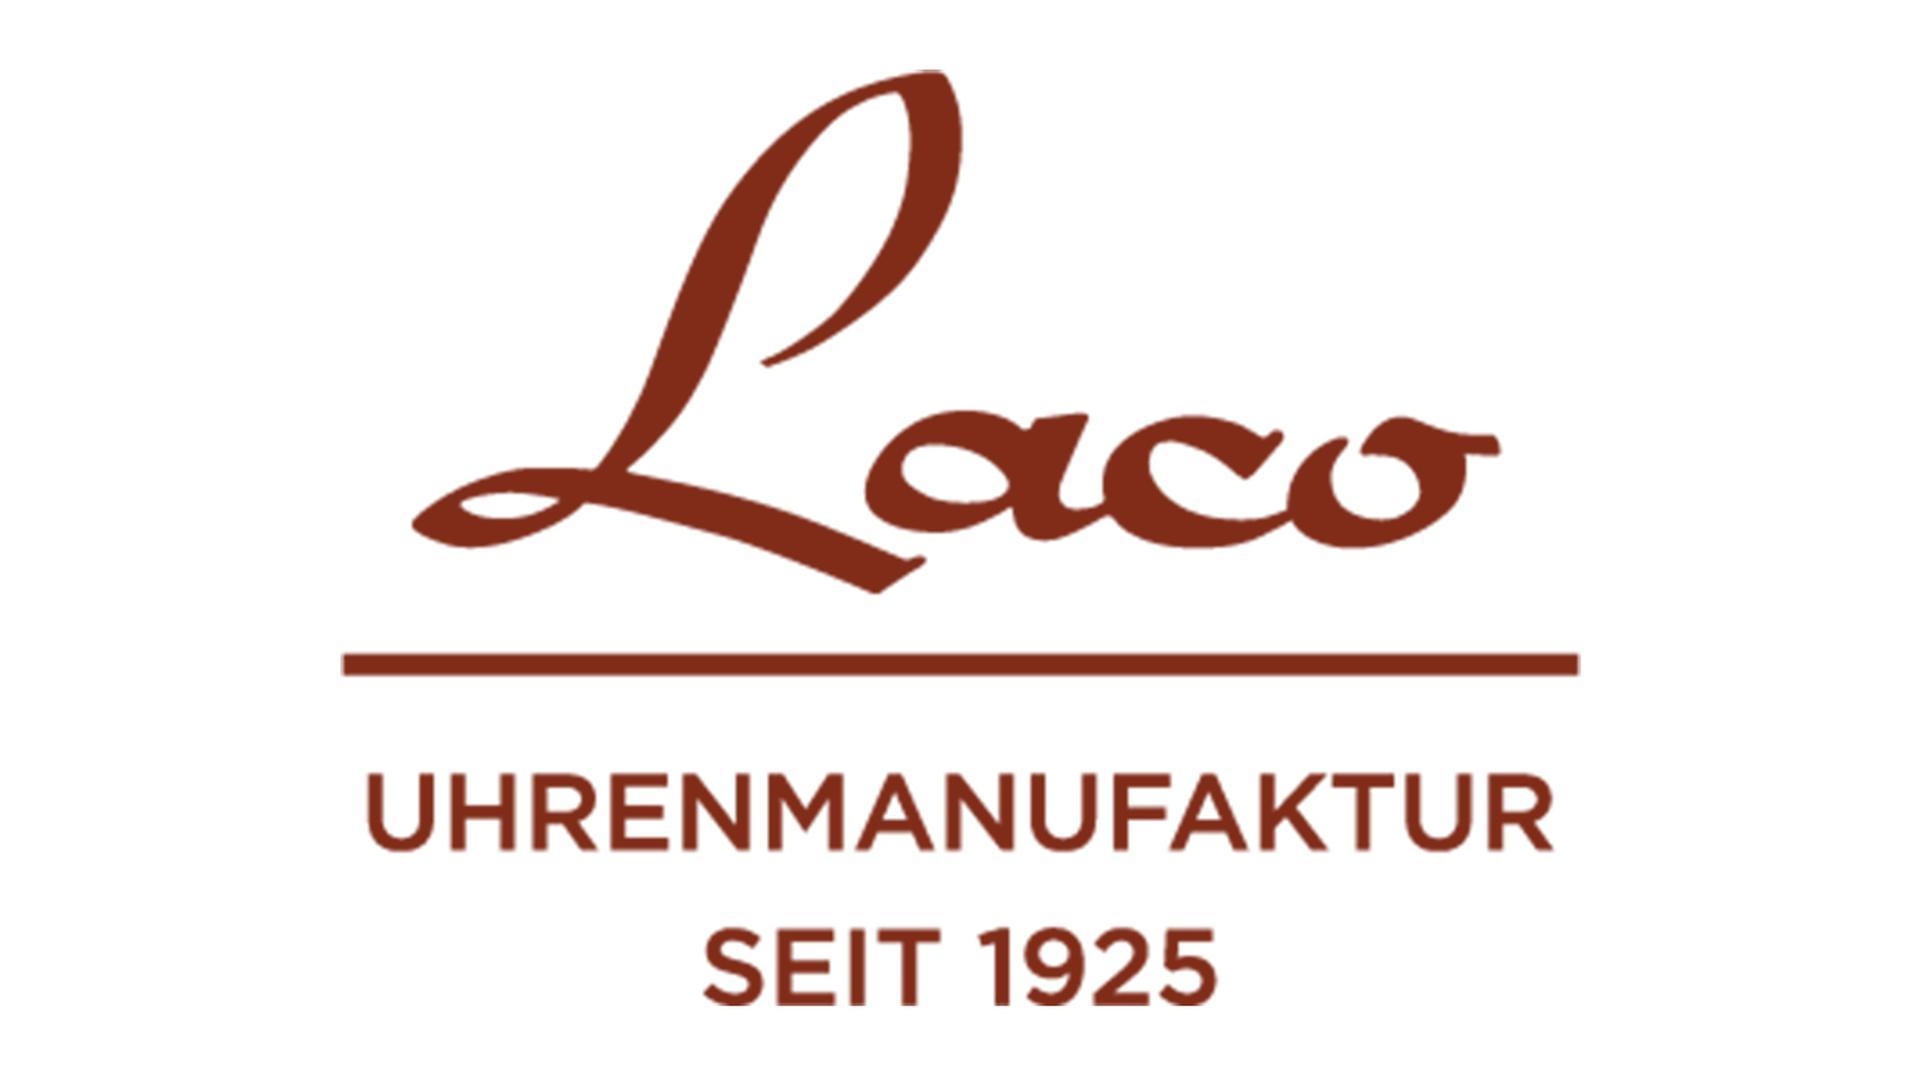 Laco: Uhrenmanufaktur seit 1925